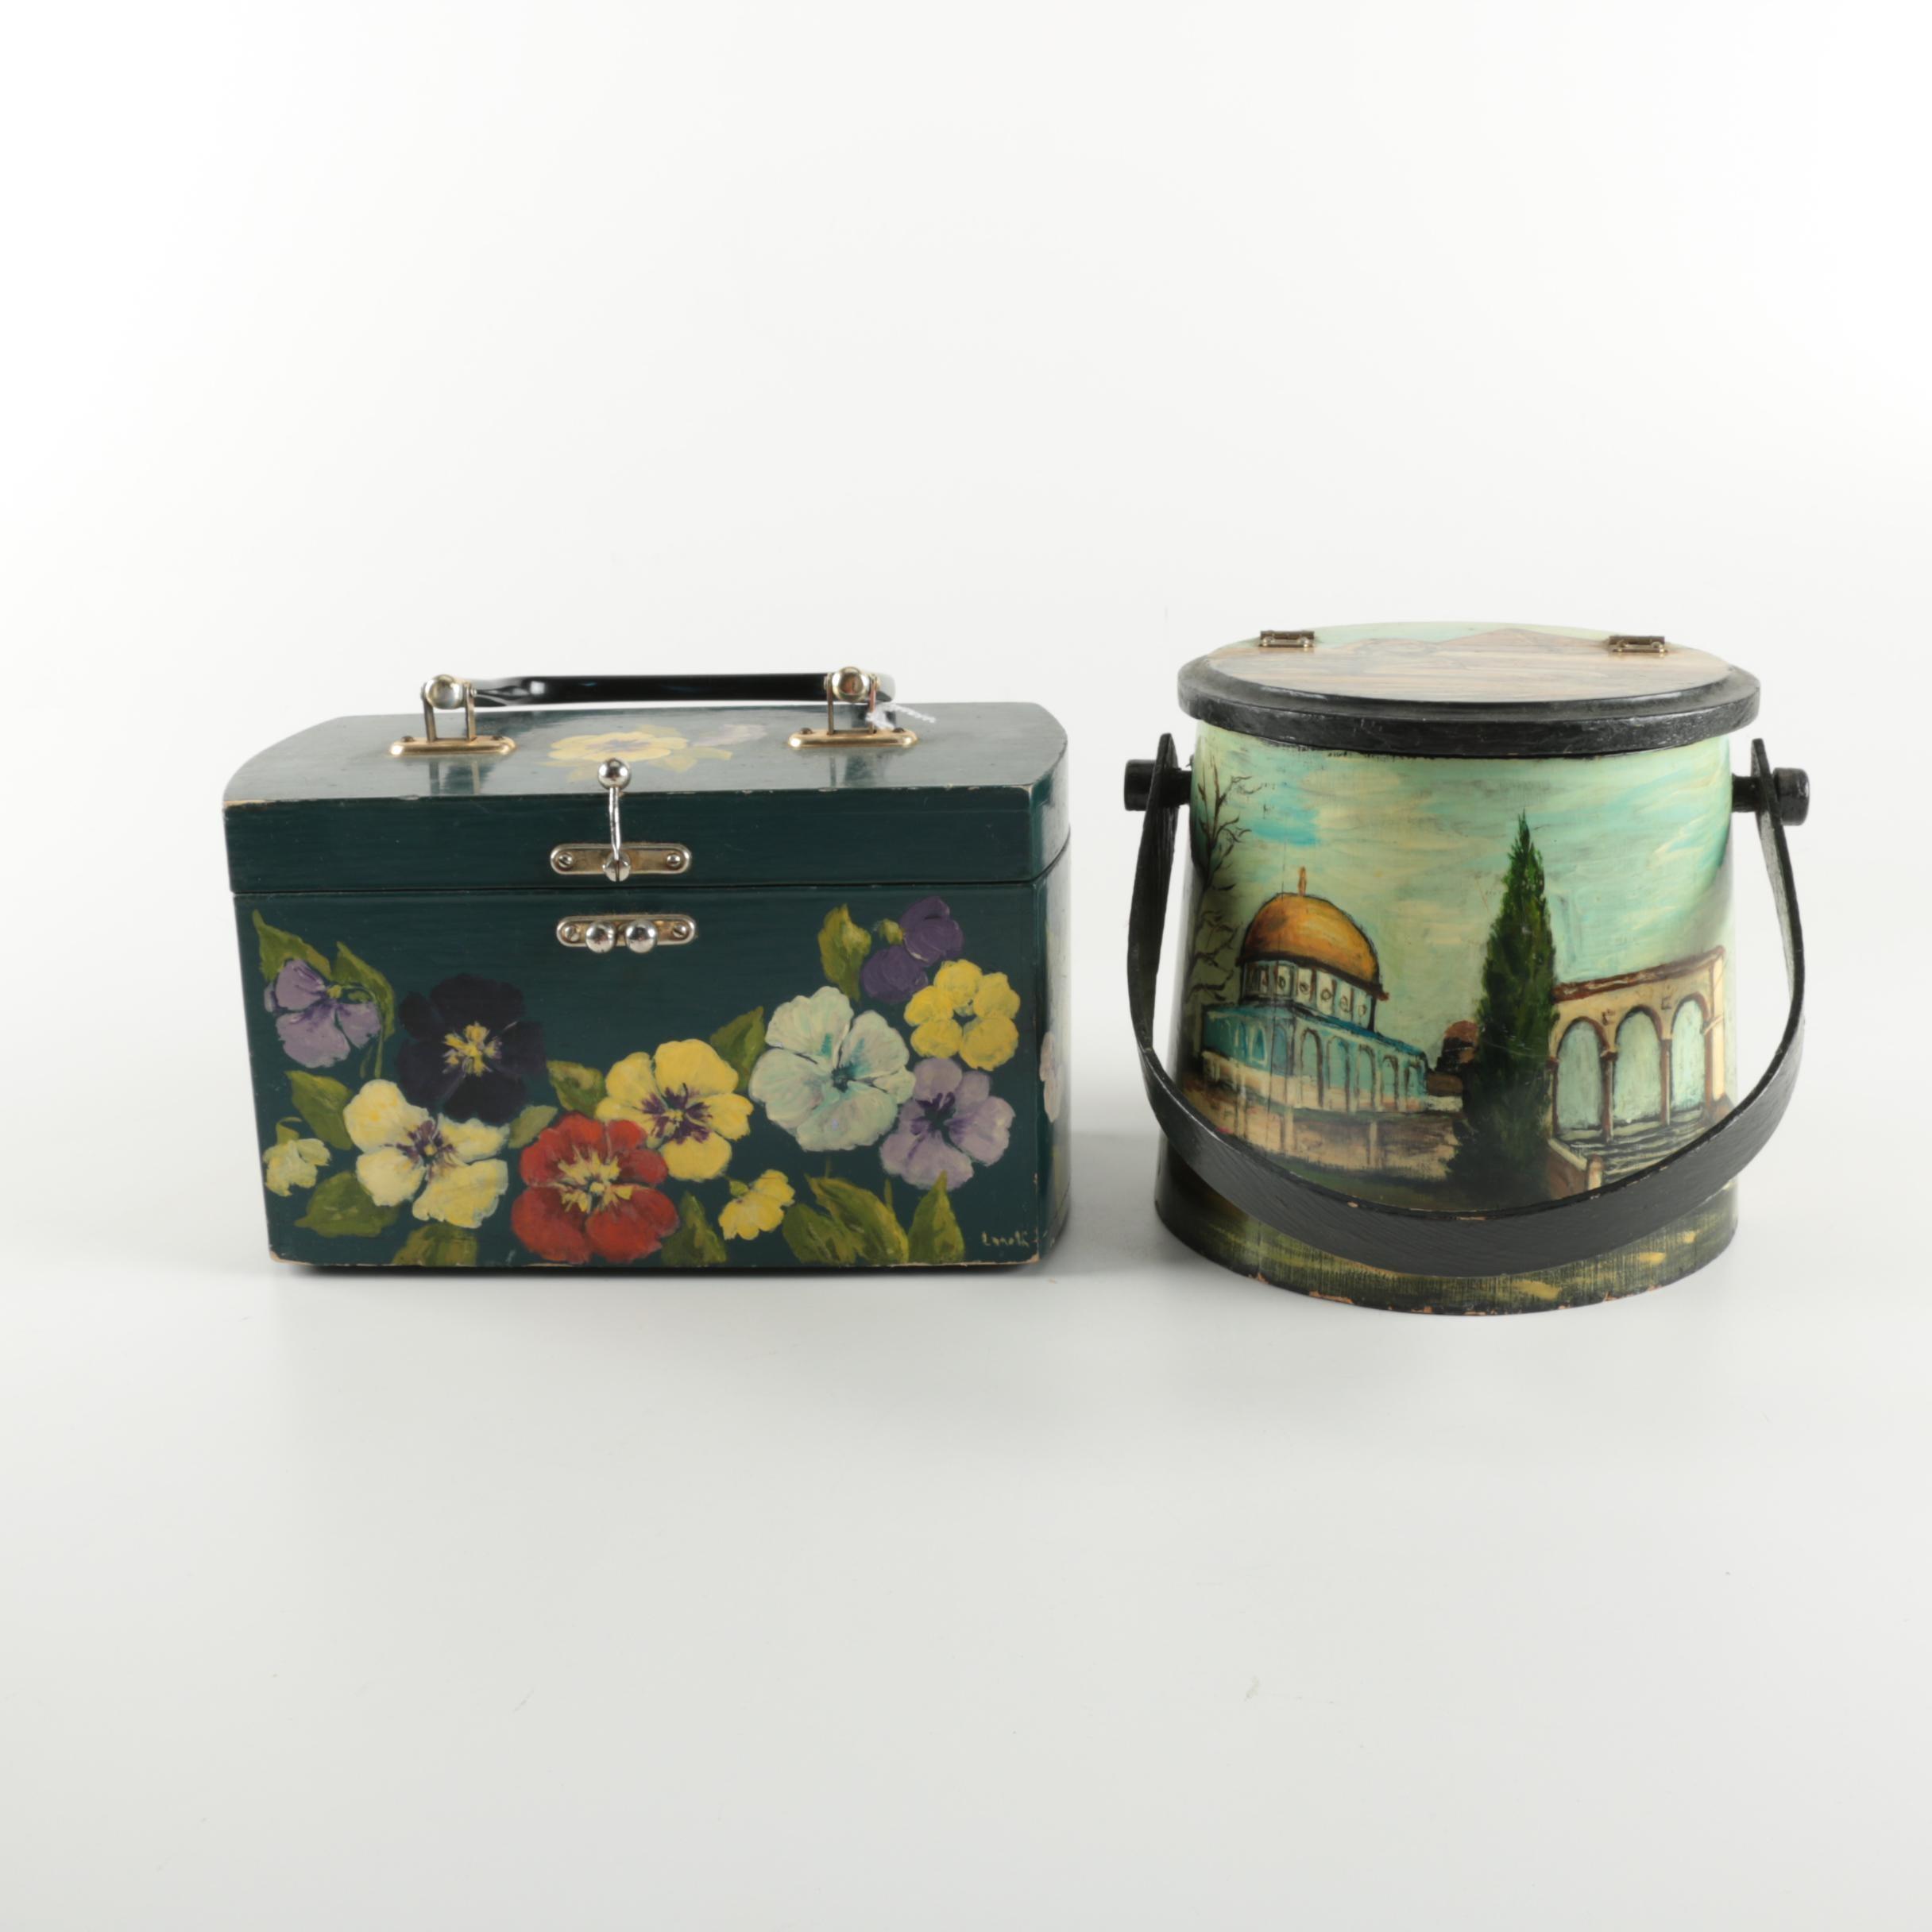 Vintage Hand-Painted Wooden Handbags